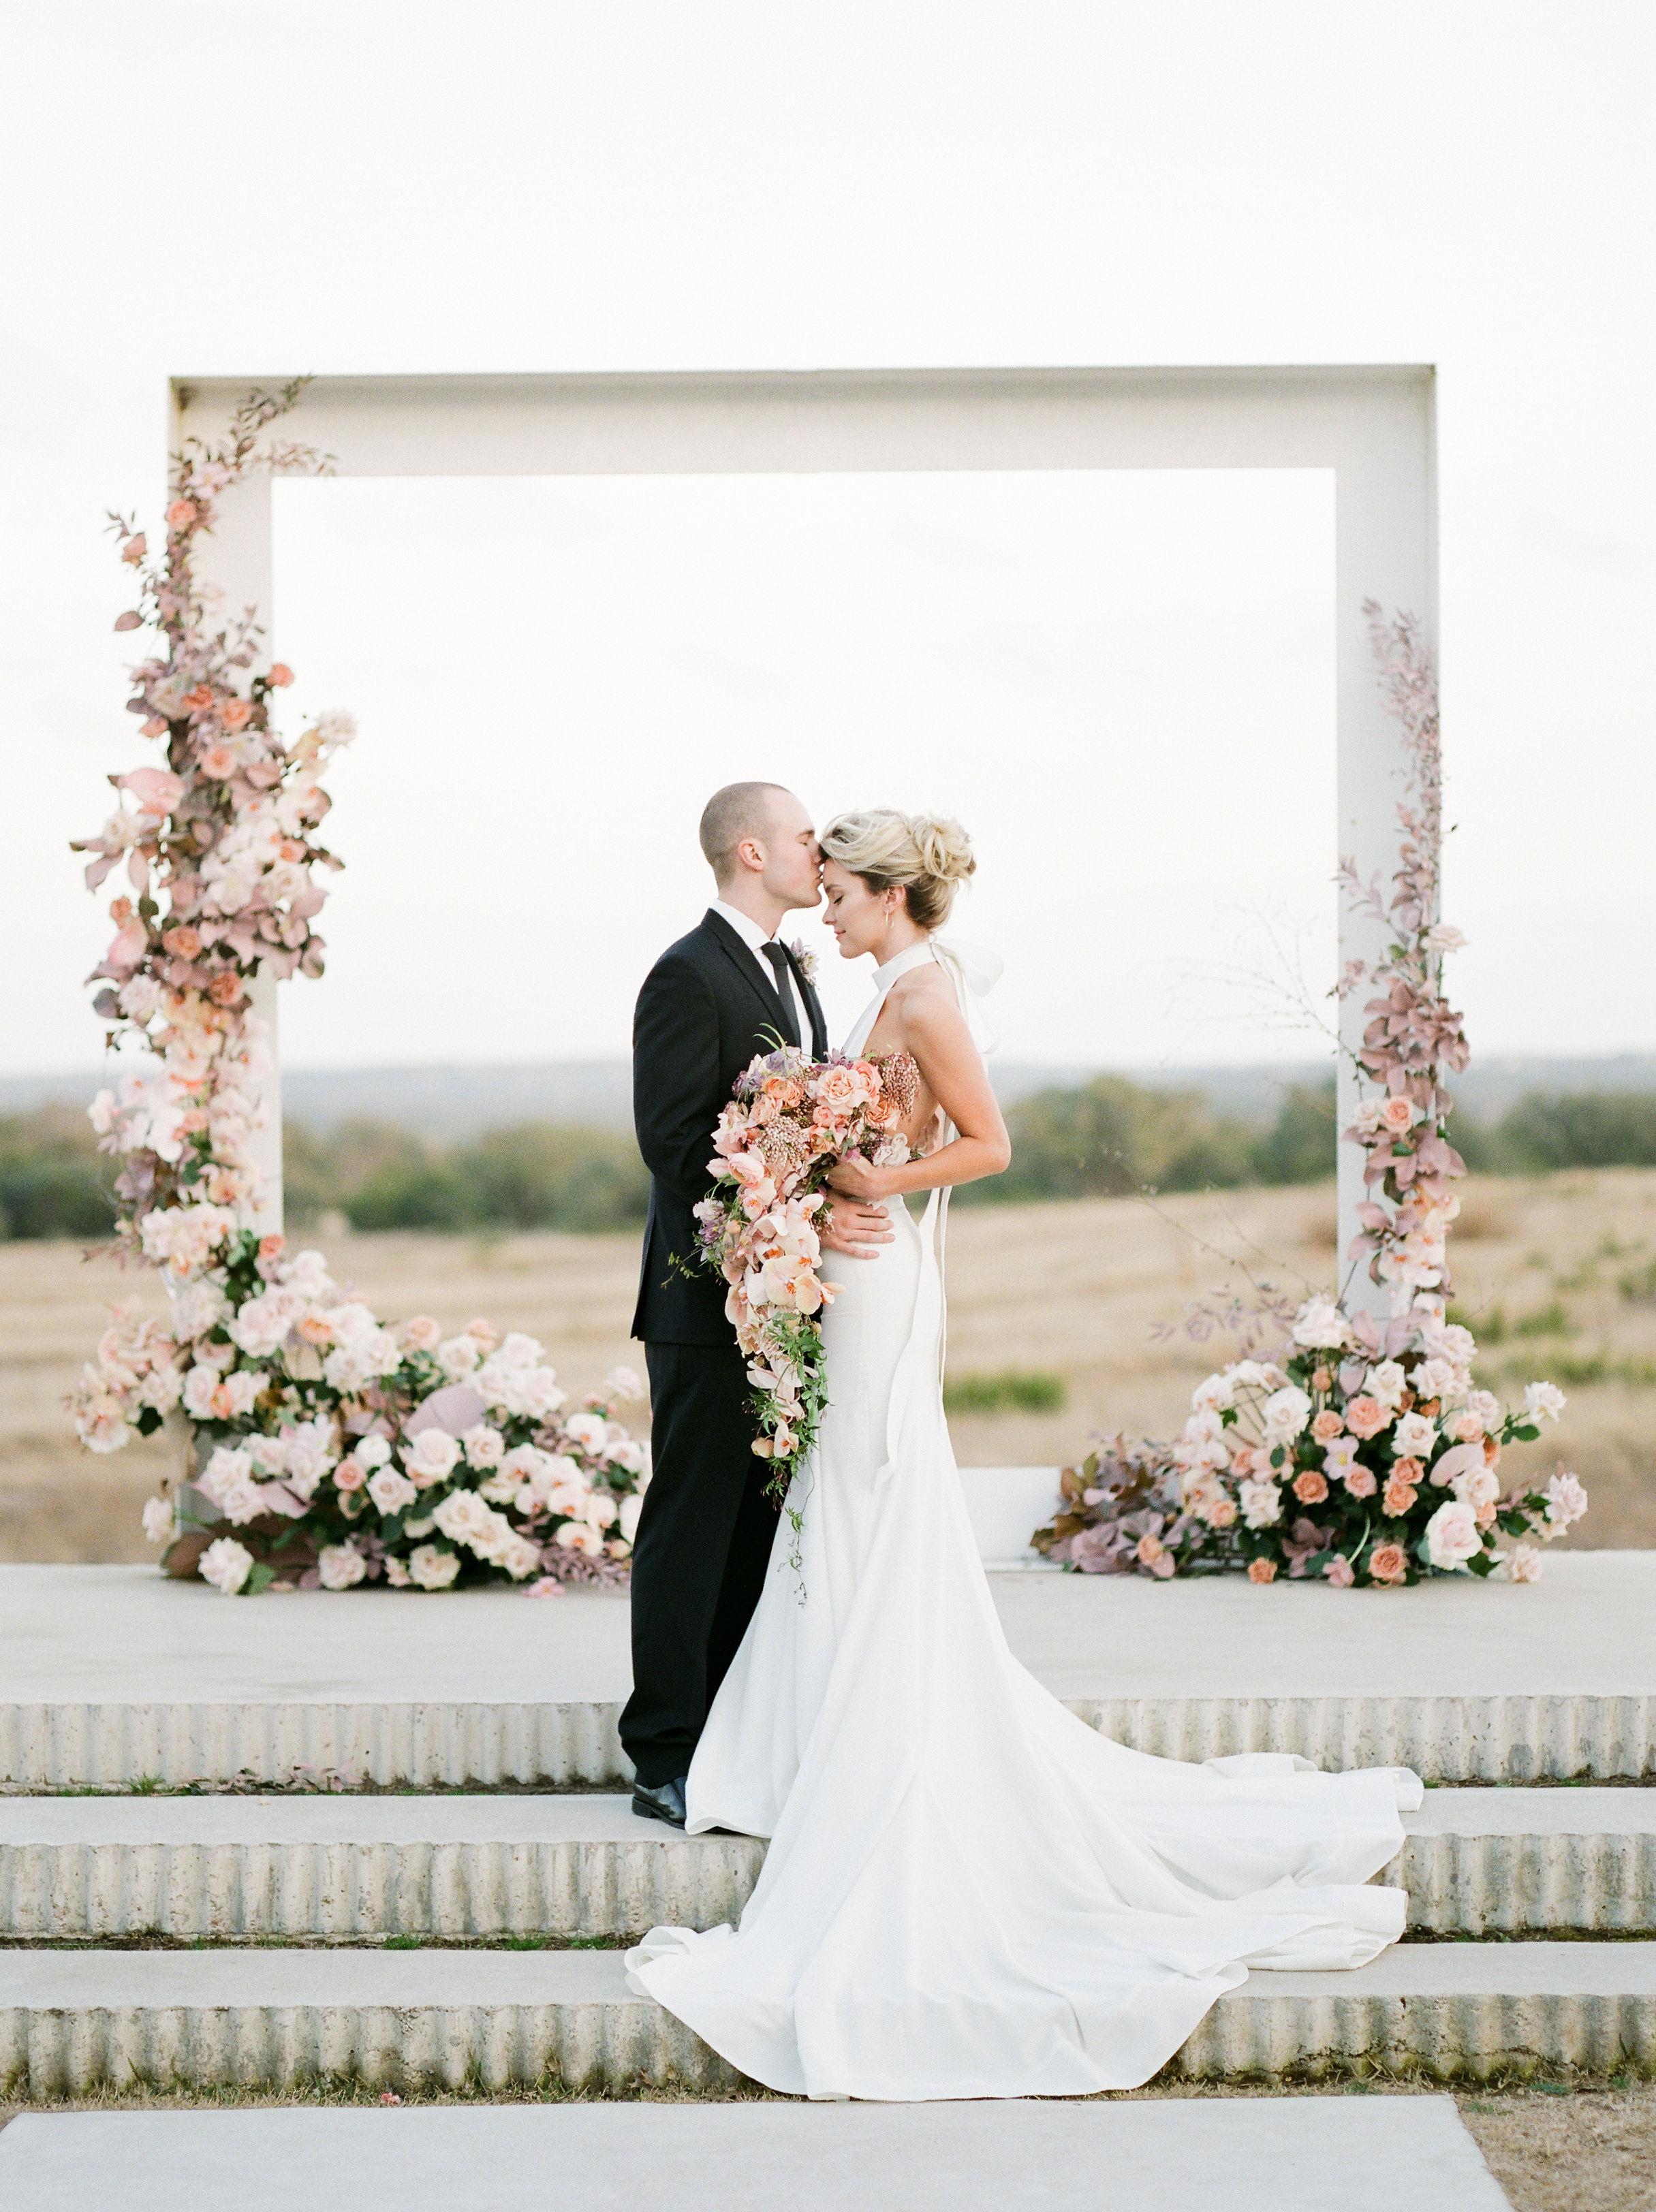 Creative Wedding Ceremony Backdrops